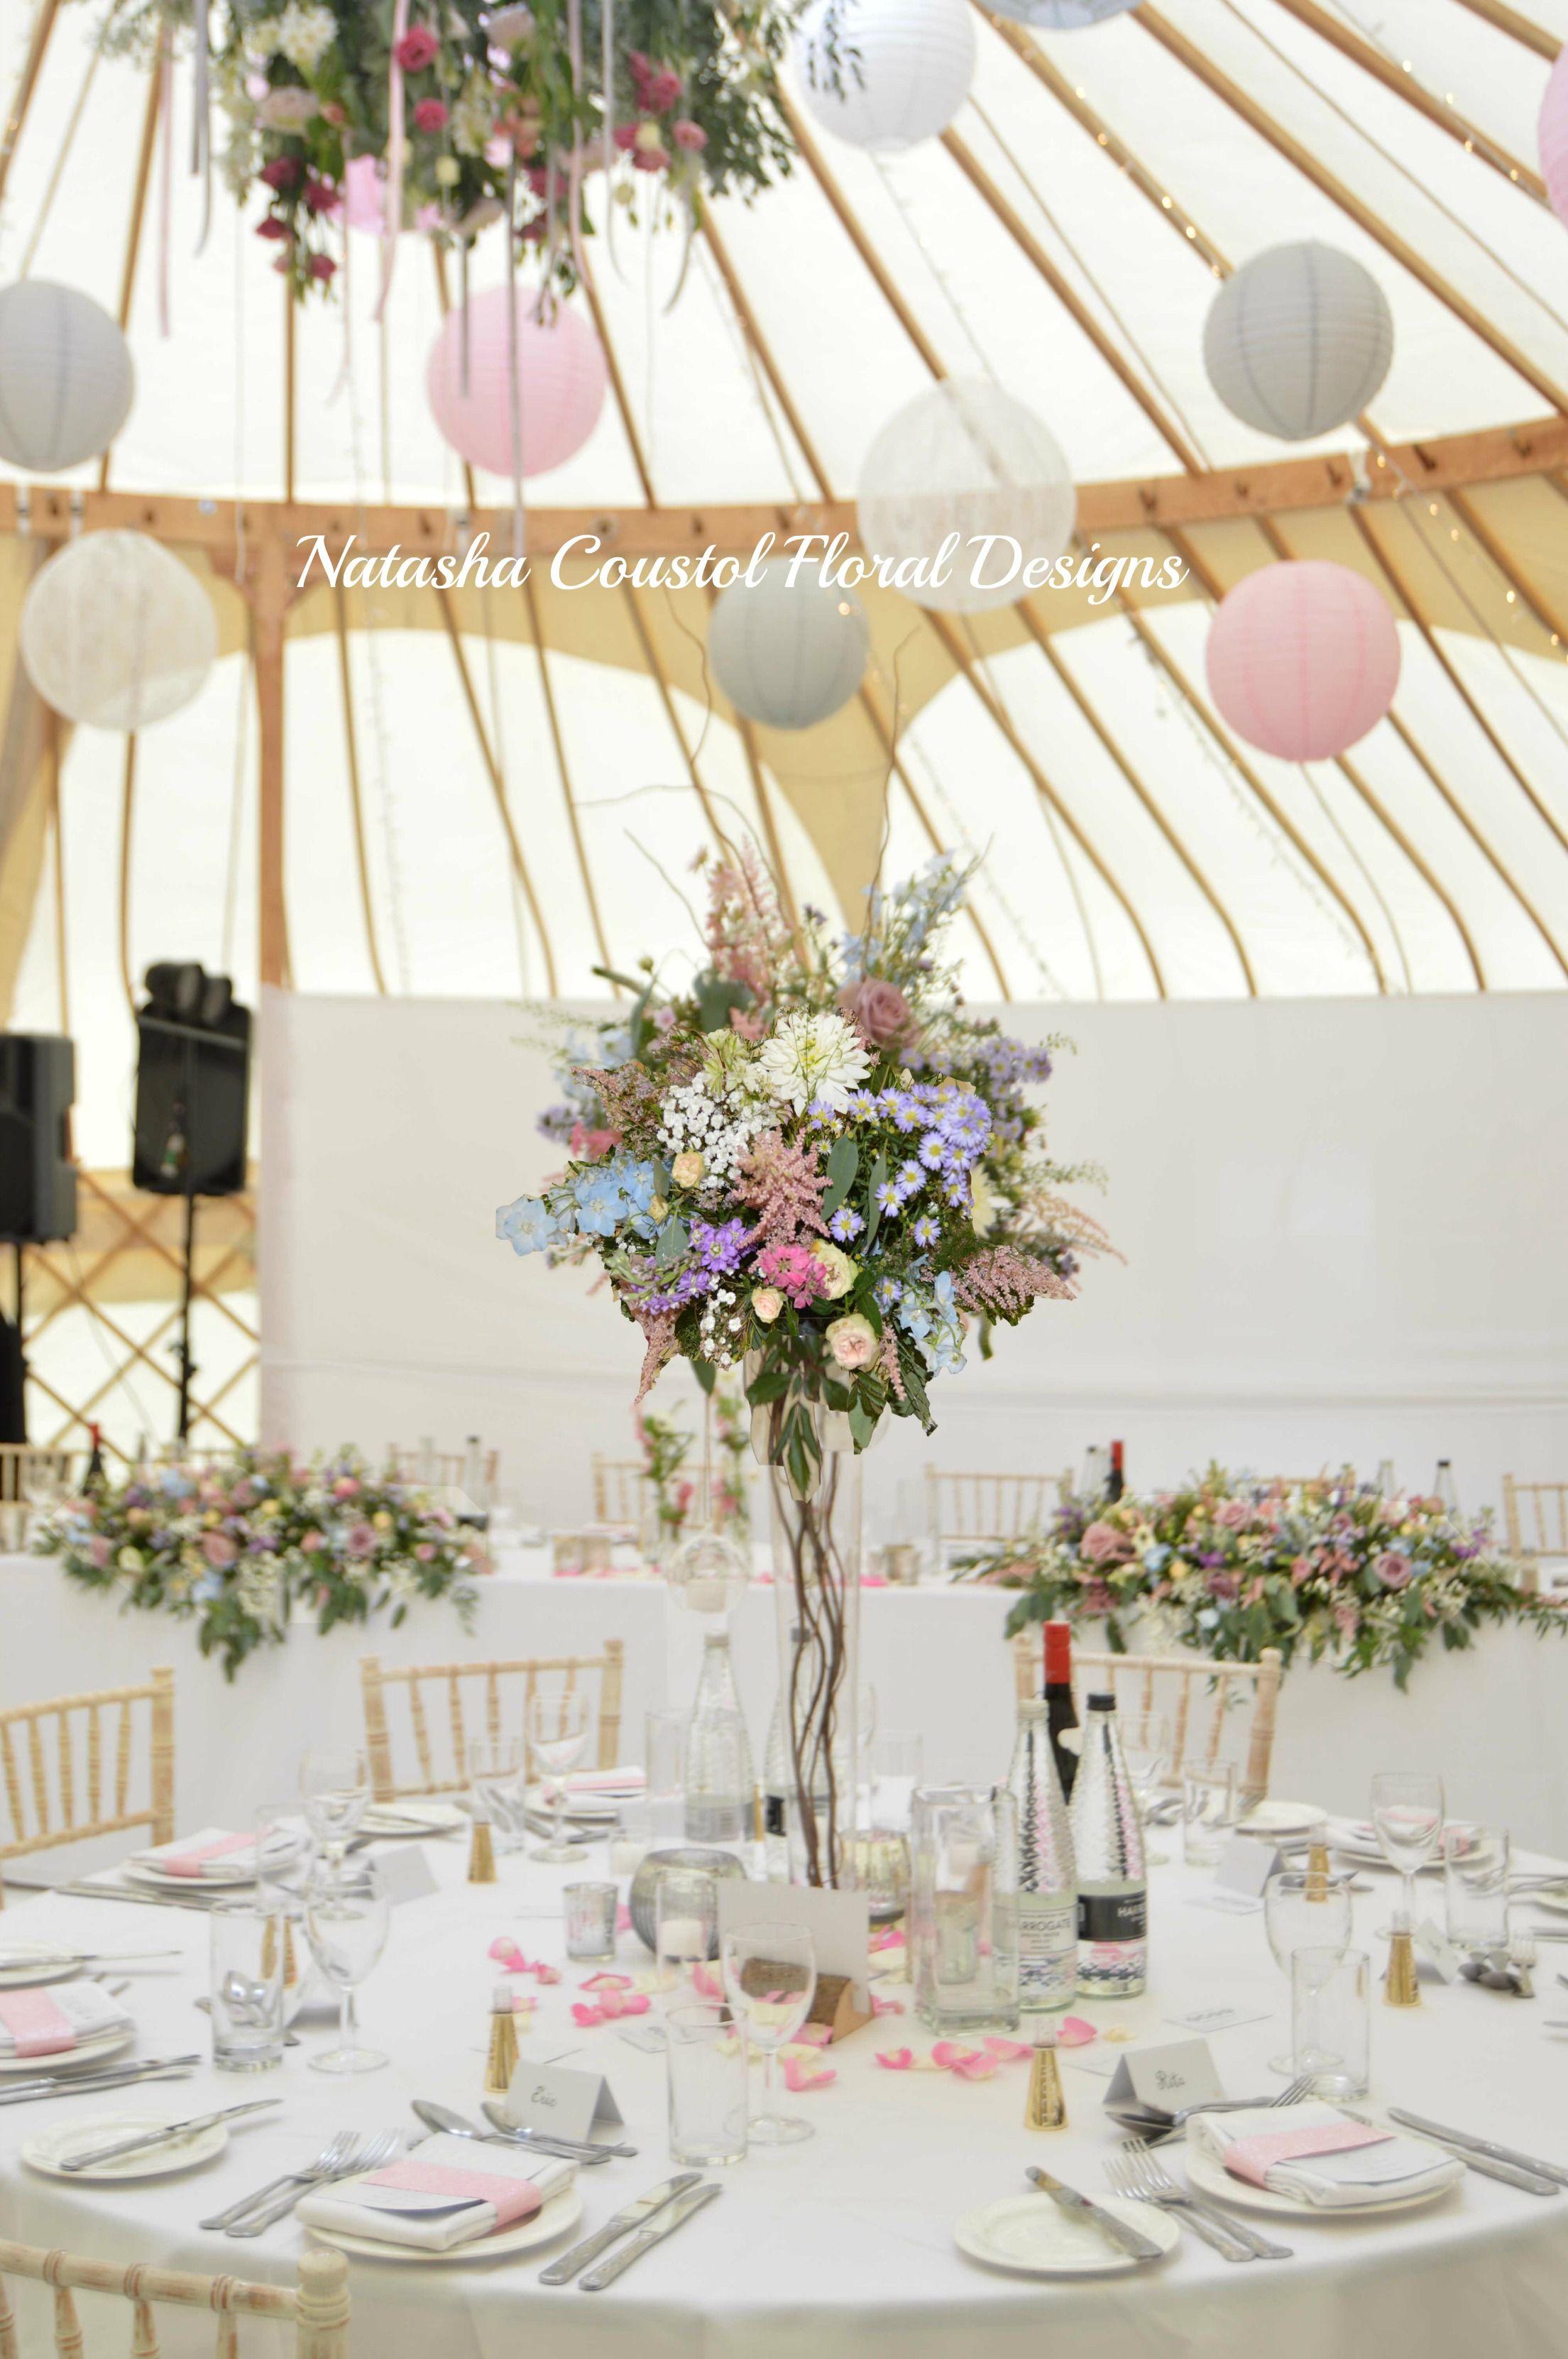 Yurt Tall Flower Centerpiece Rustic Country Garden Wedding Flowers Ball Of Pastel